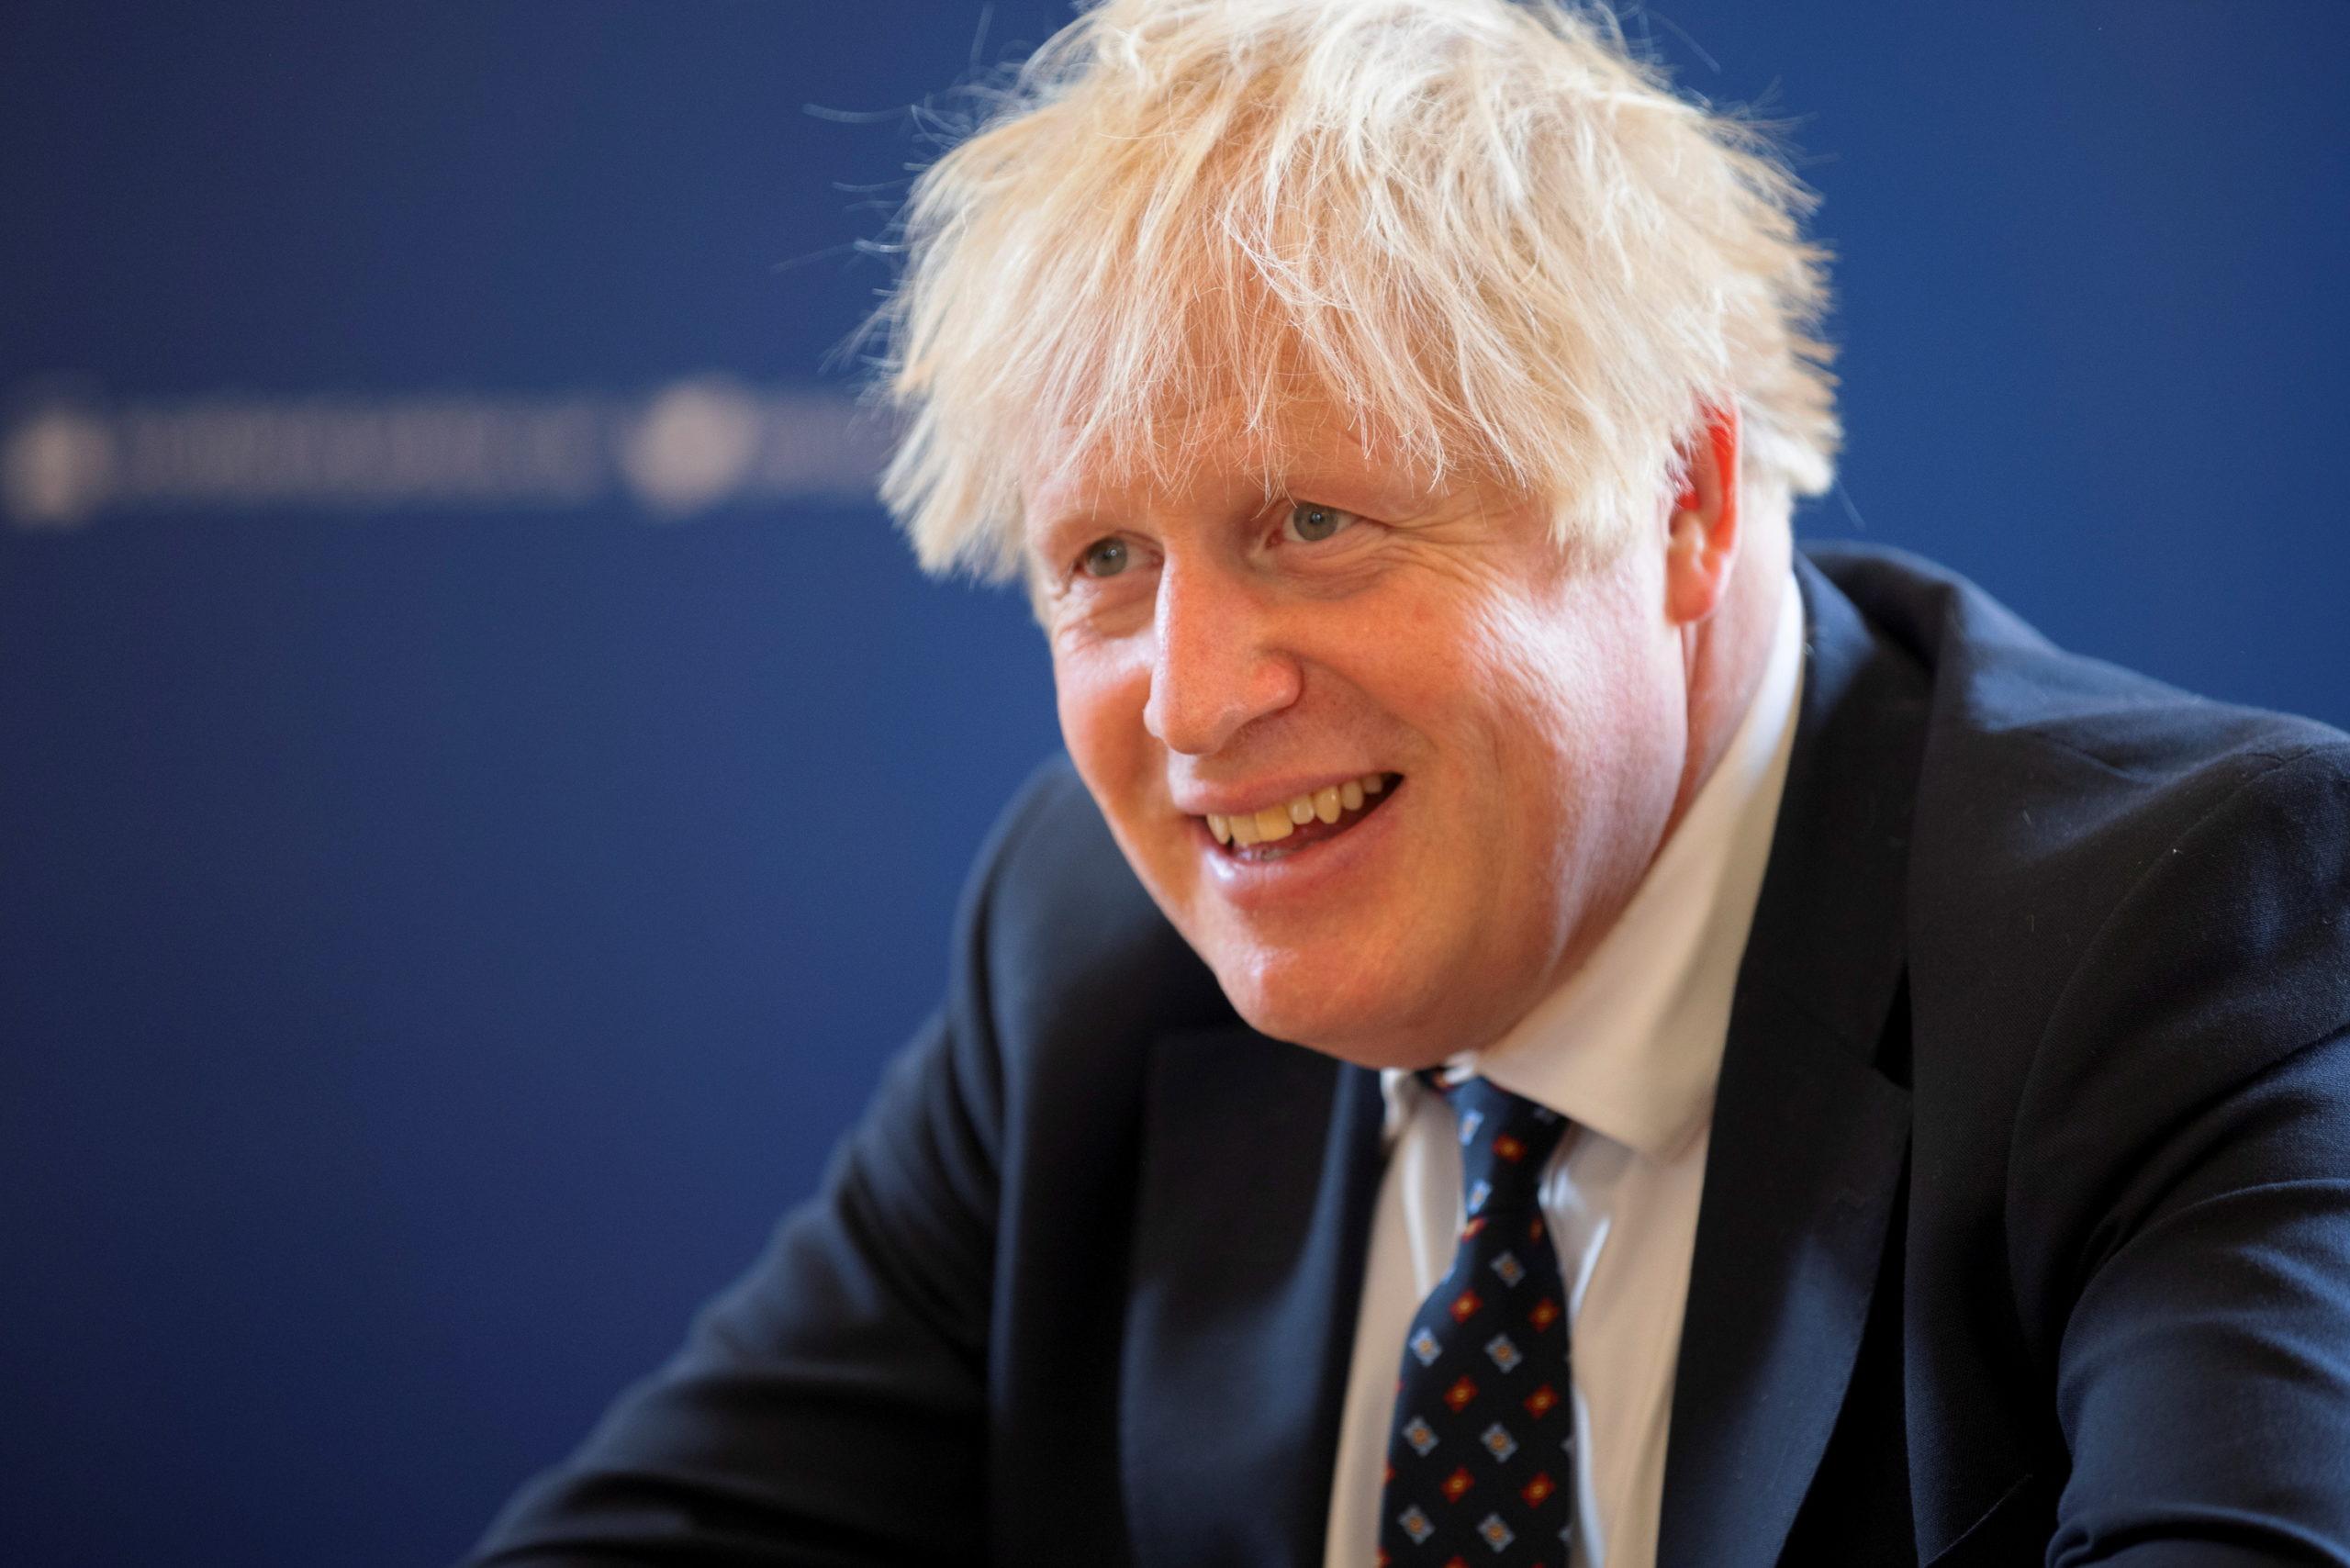 Boris Johnson aims to beat Thatchers 11 years in office